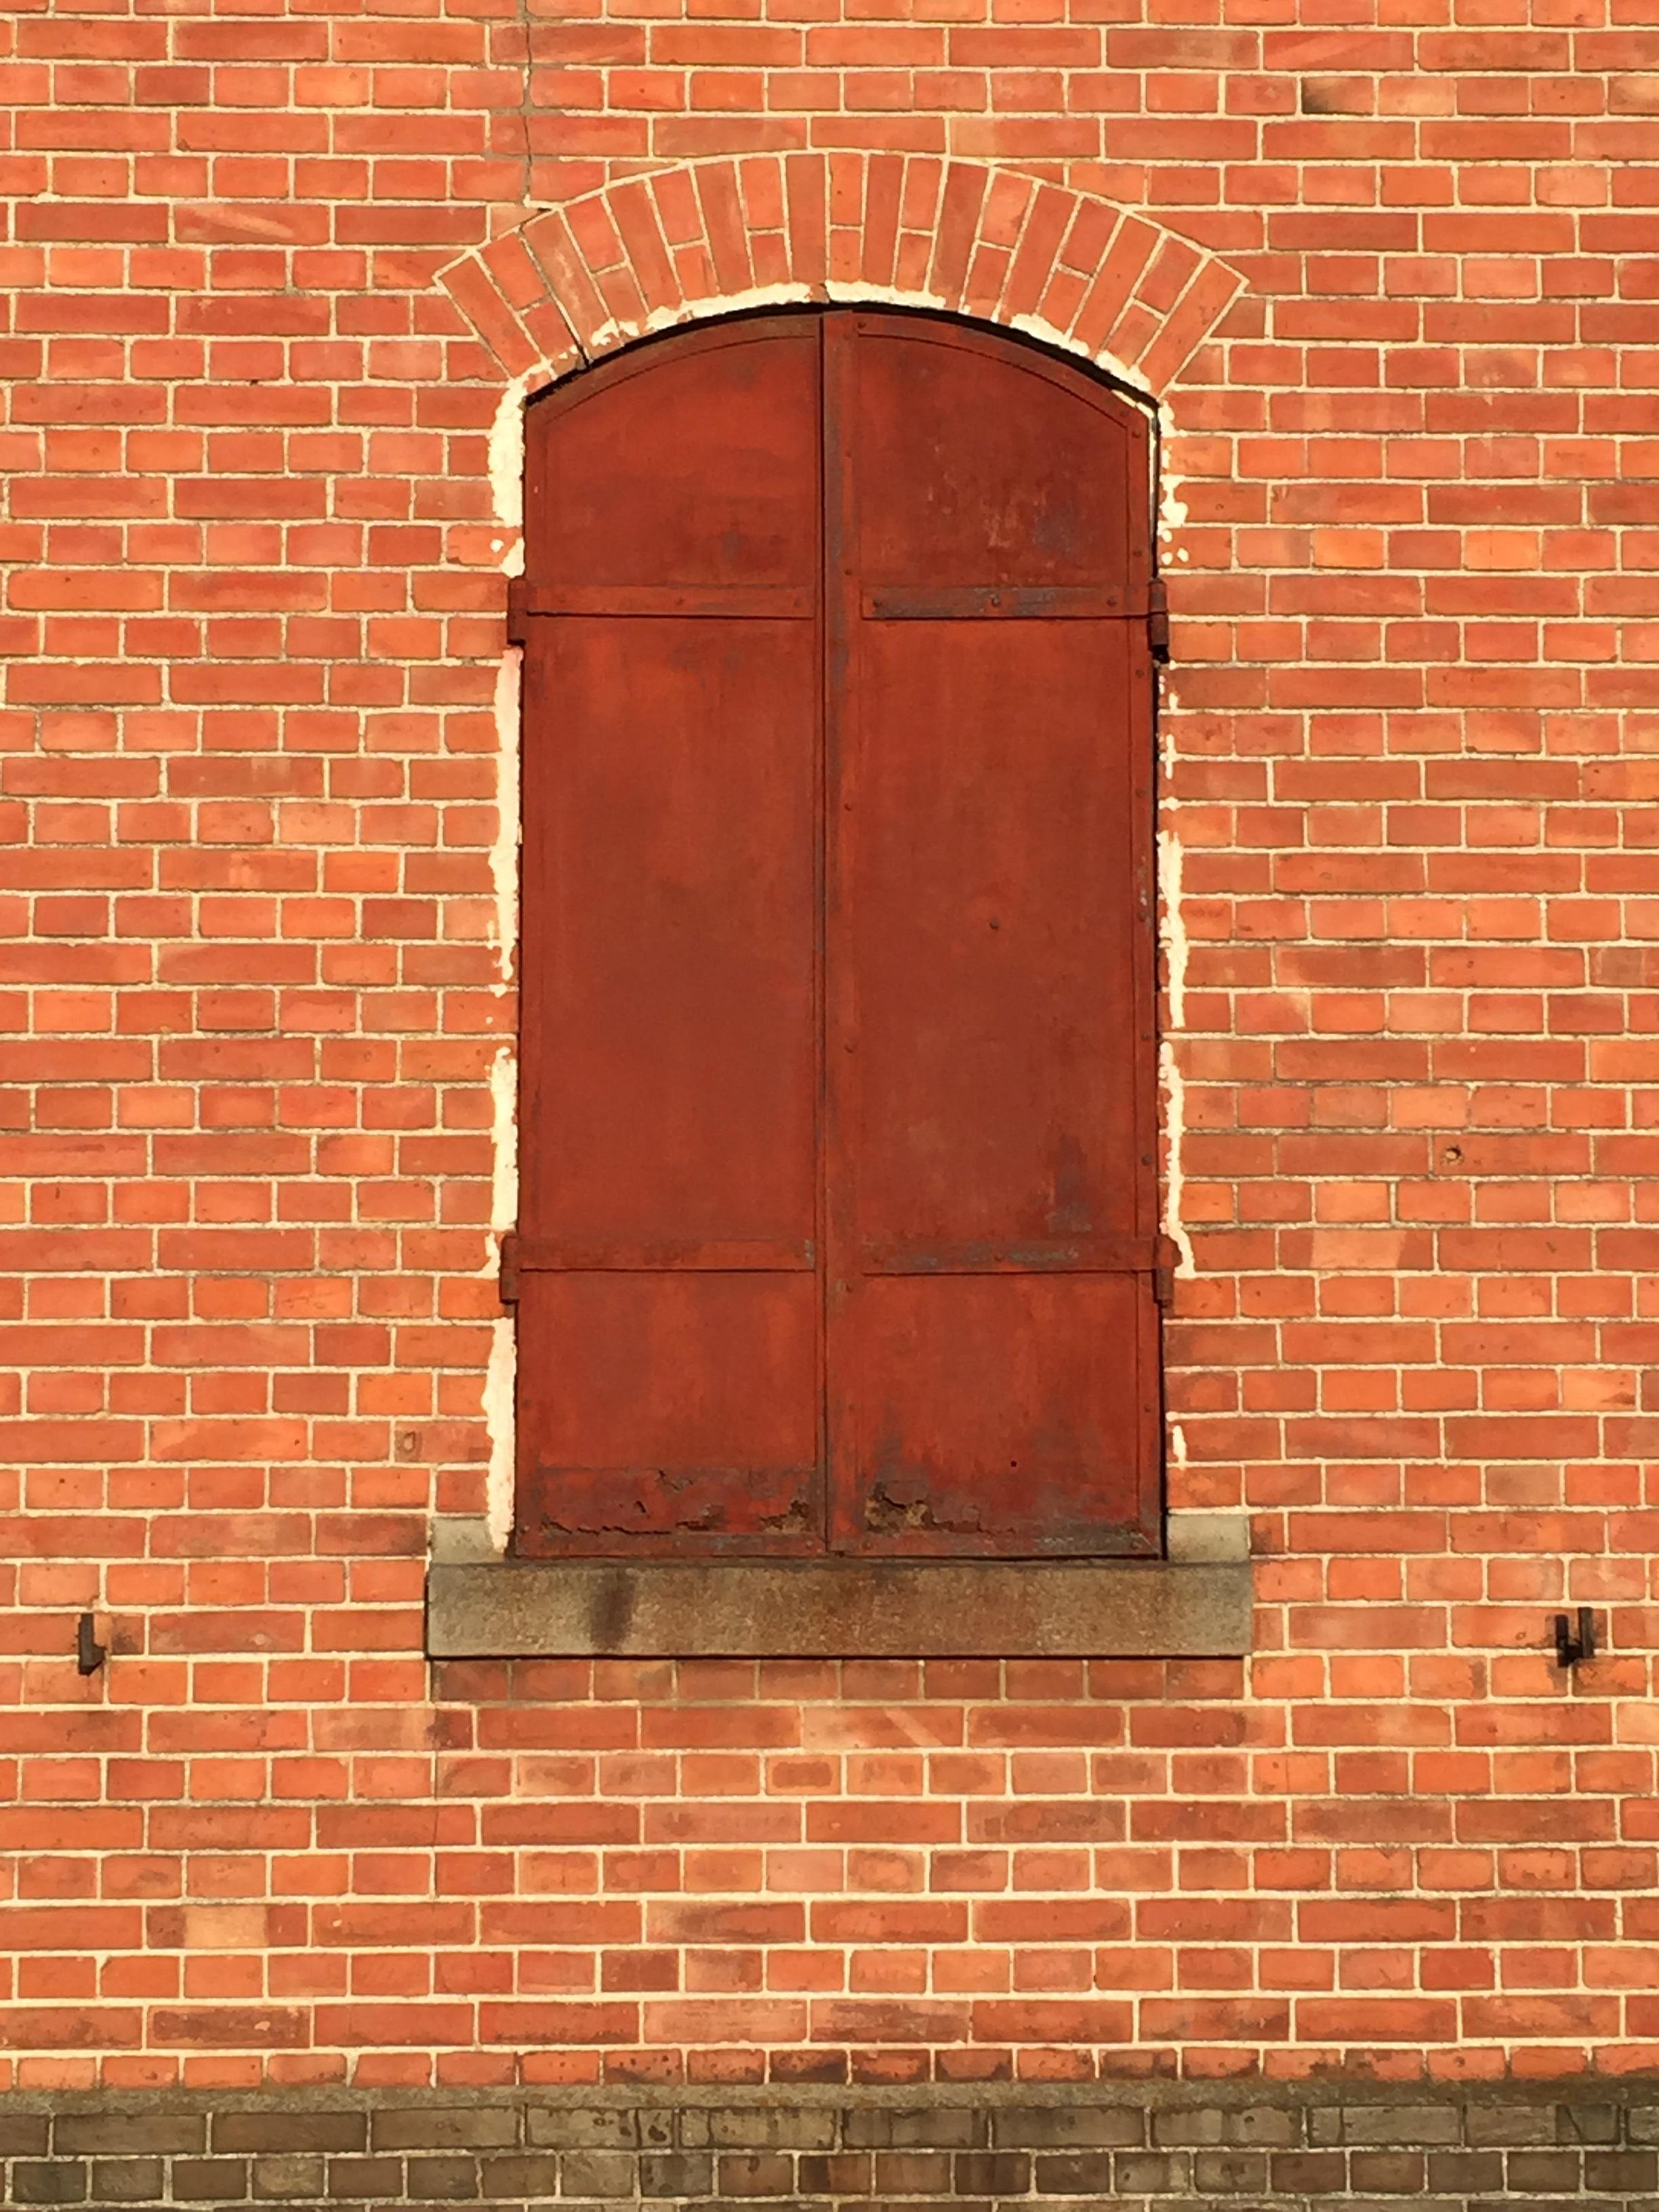 Holz Fenster Mauer Rot Farbe Fassade Ziegel Tür Material Warenhaus  Mauerwerk Seide Gunma Maebashi Roter Ziegelstein